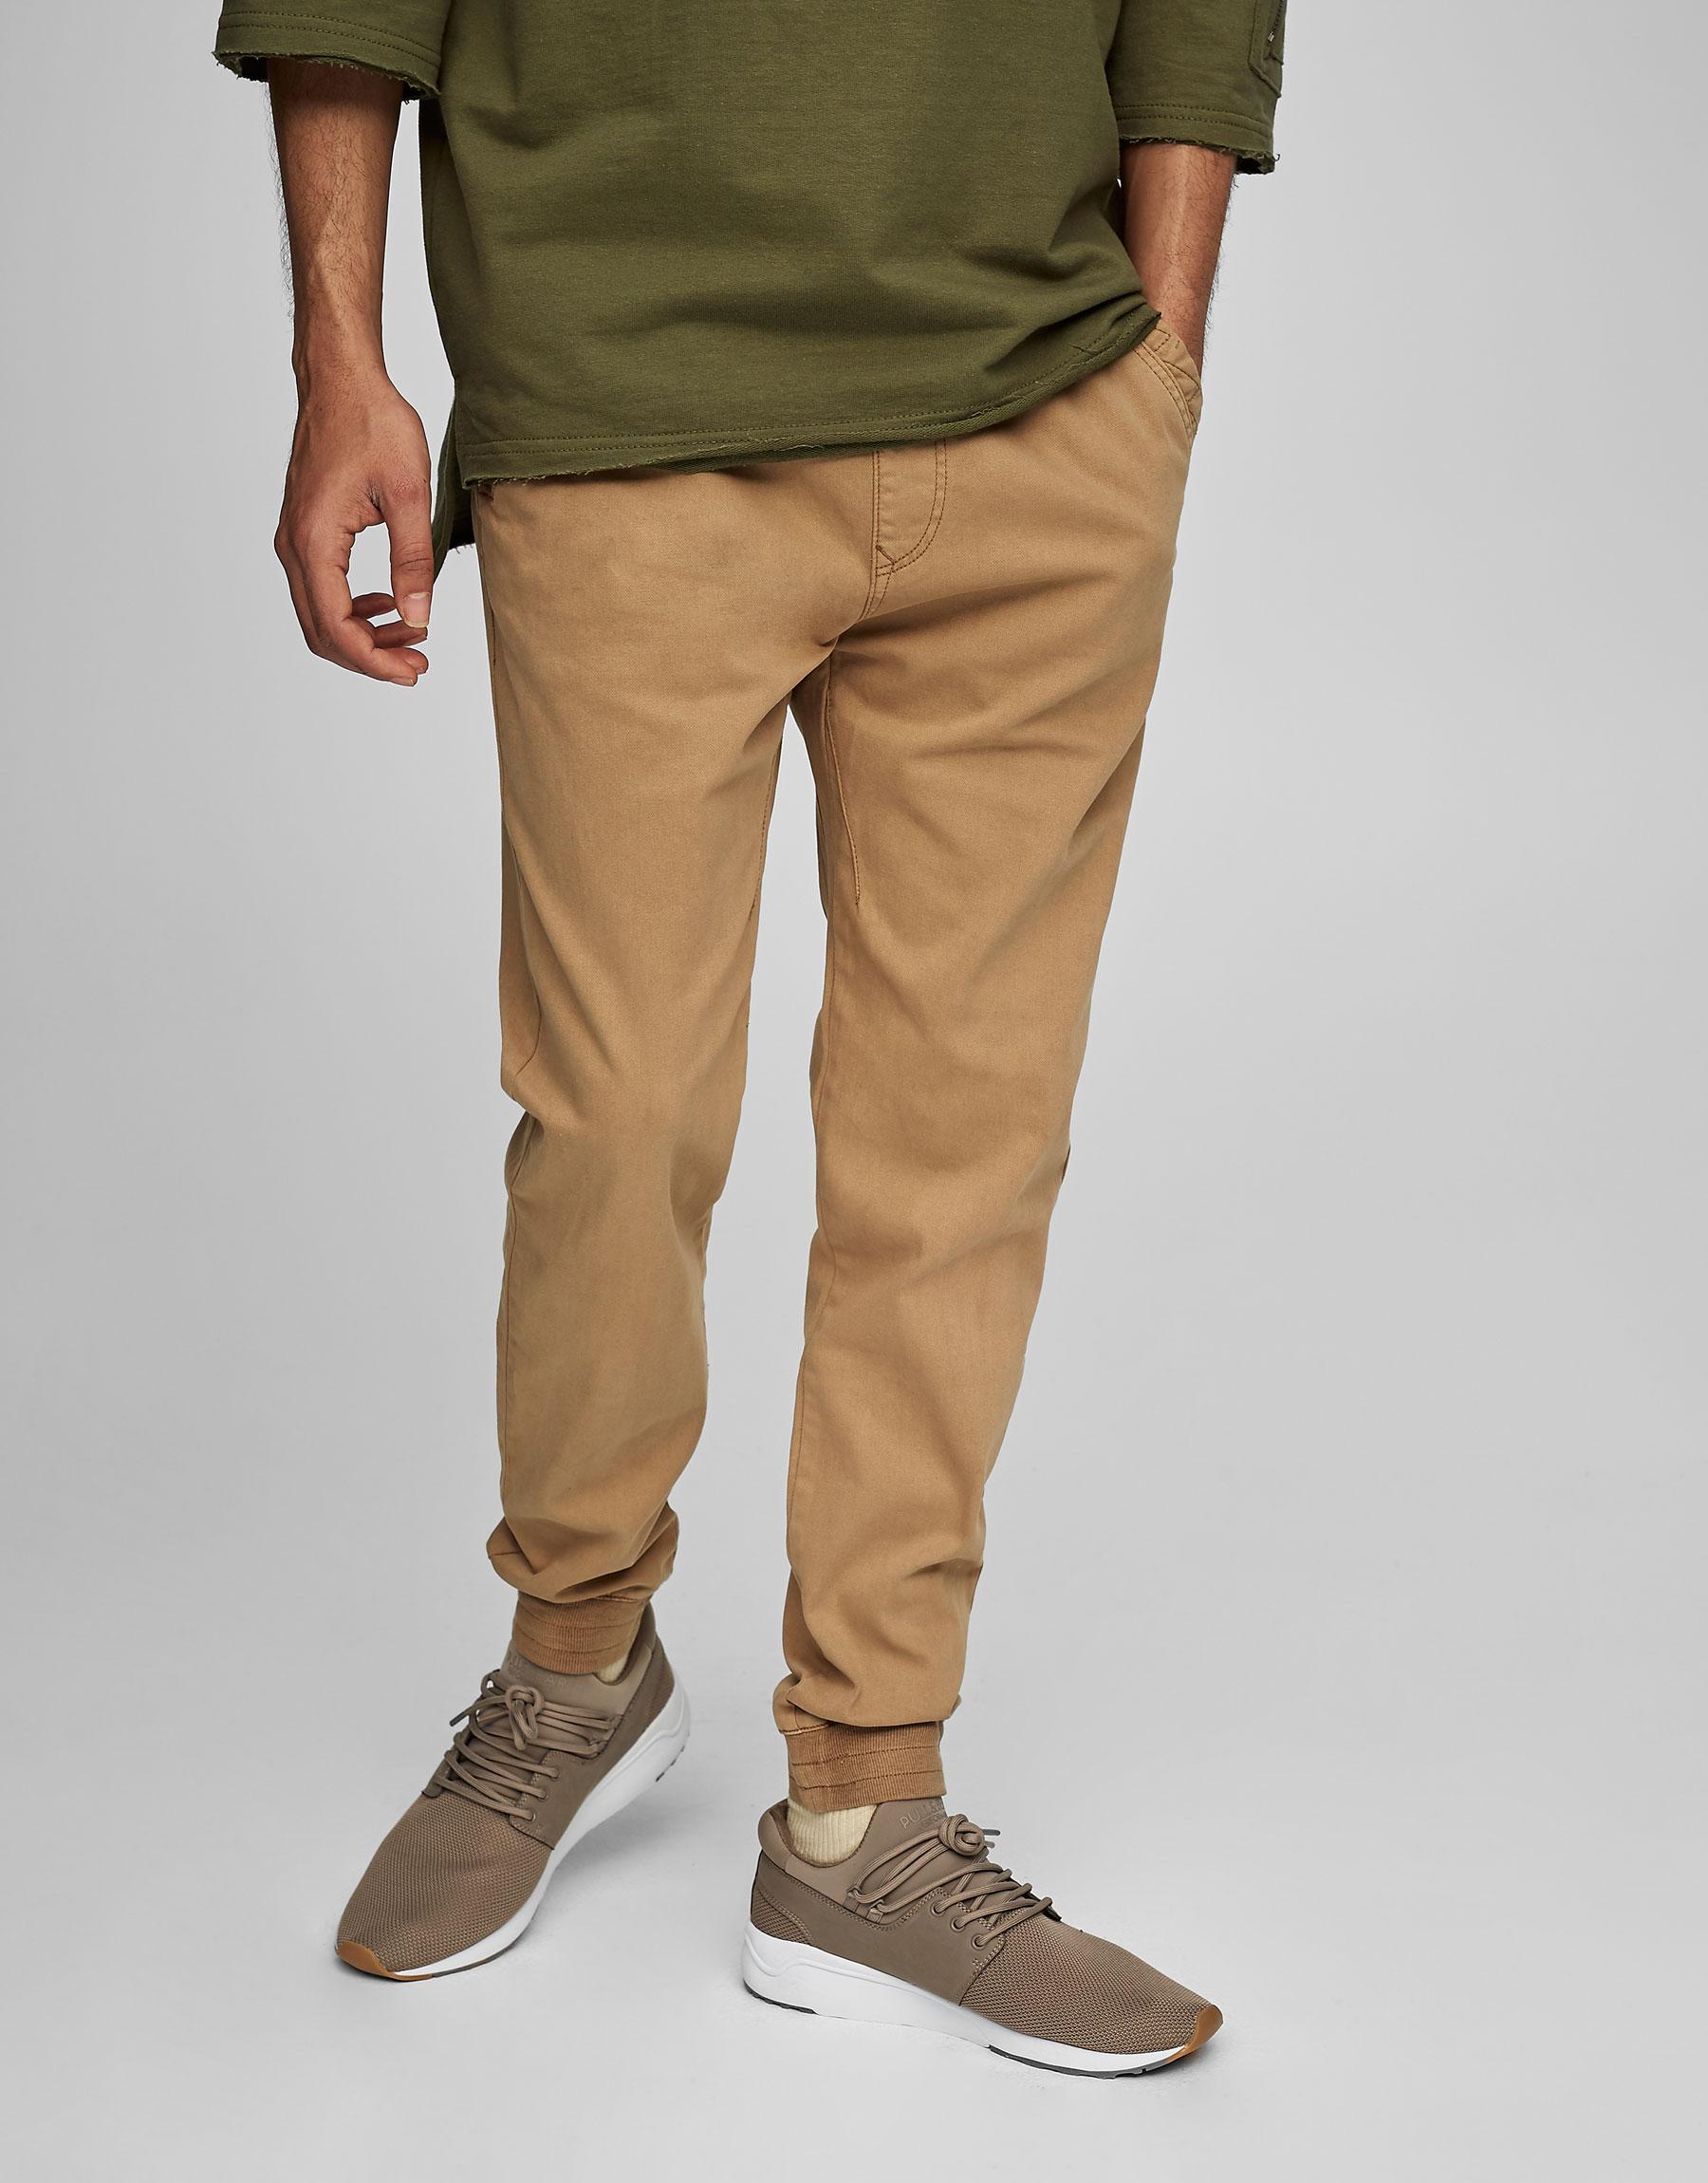 Pantalons tipus beach rentats colors